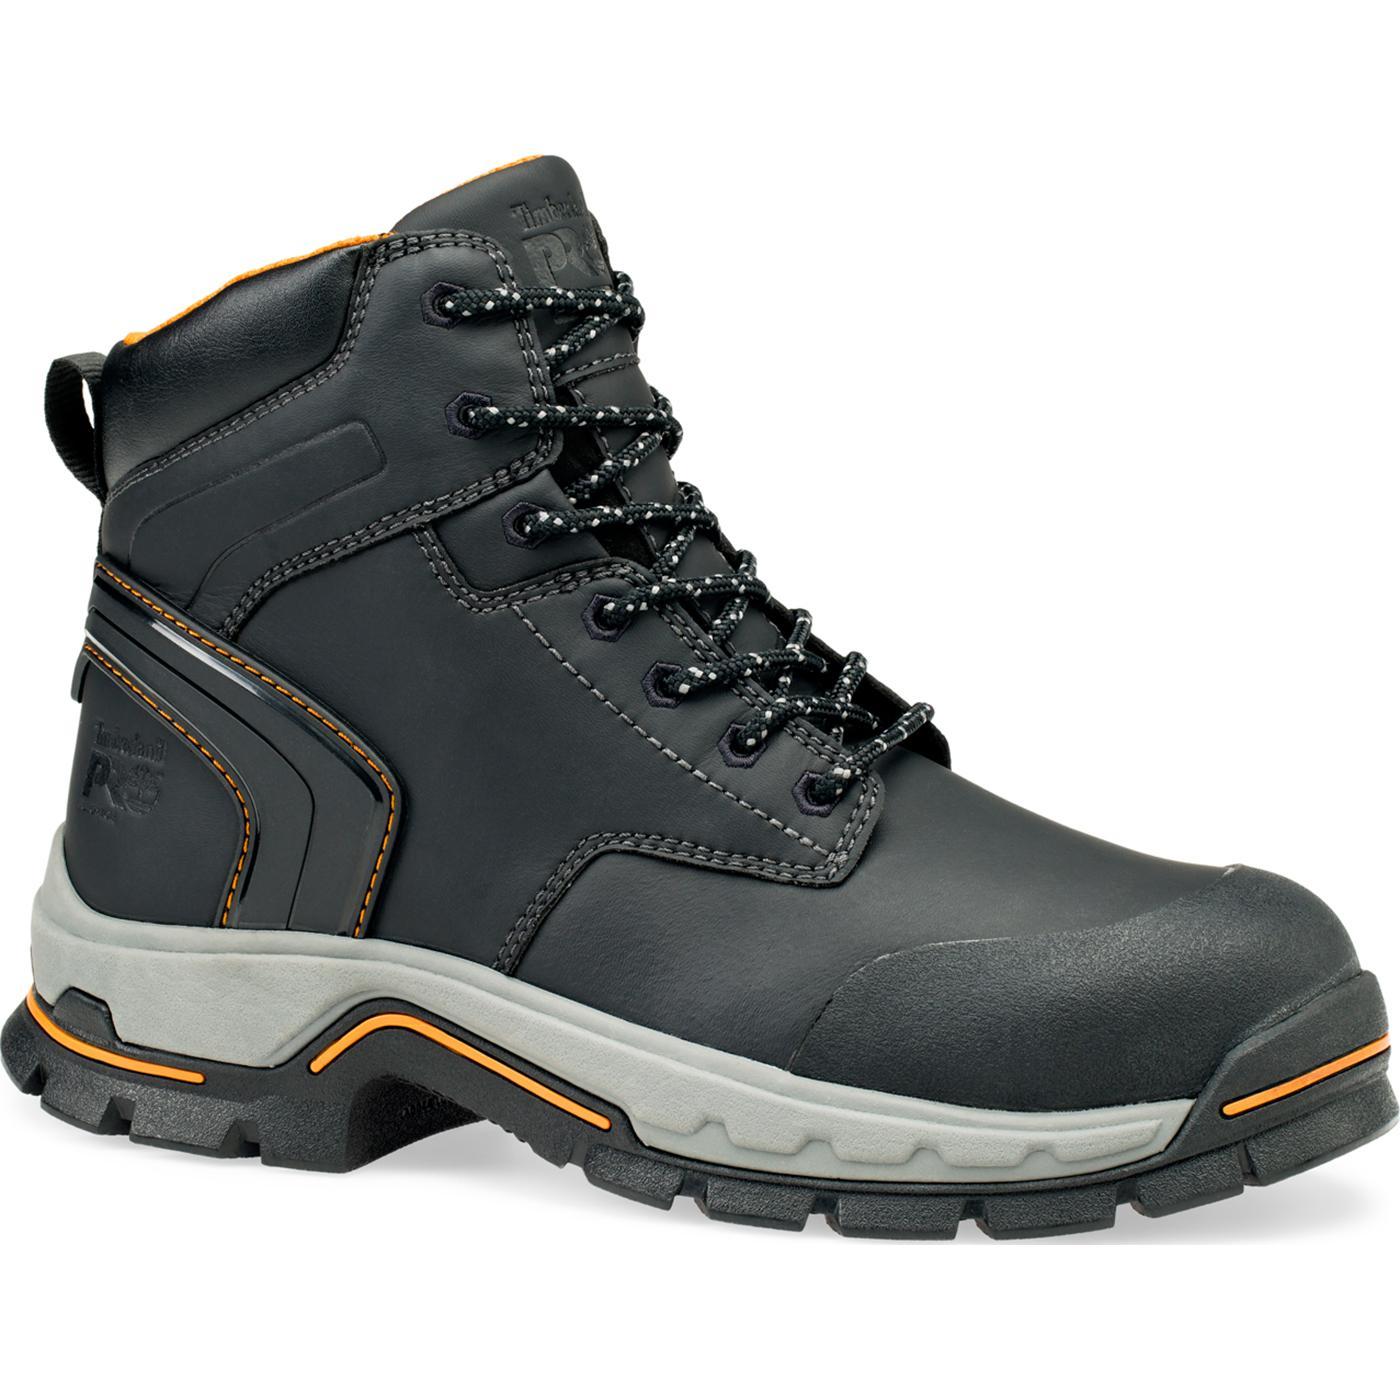 bdb33d74fb2 Timberland PRO Stockdale GripMax Alloy Toe Work Boot